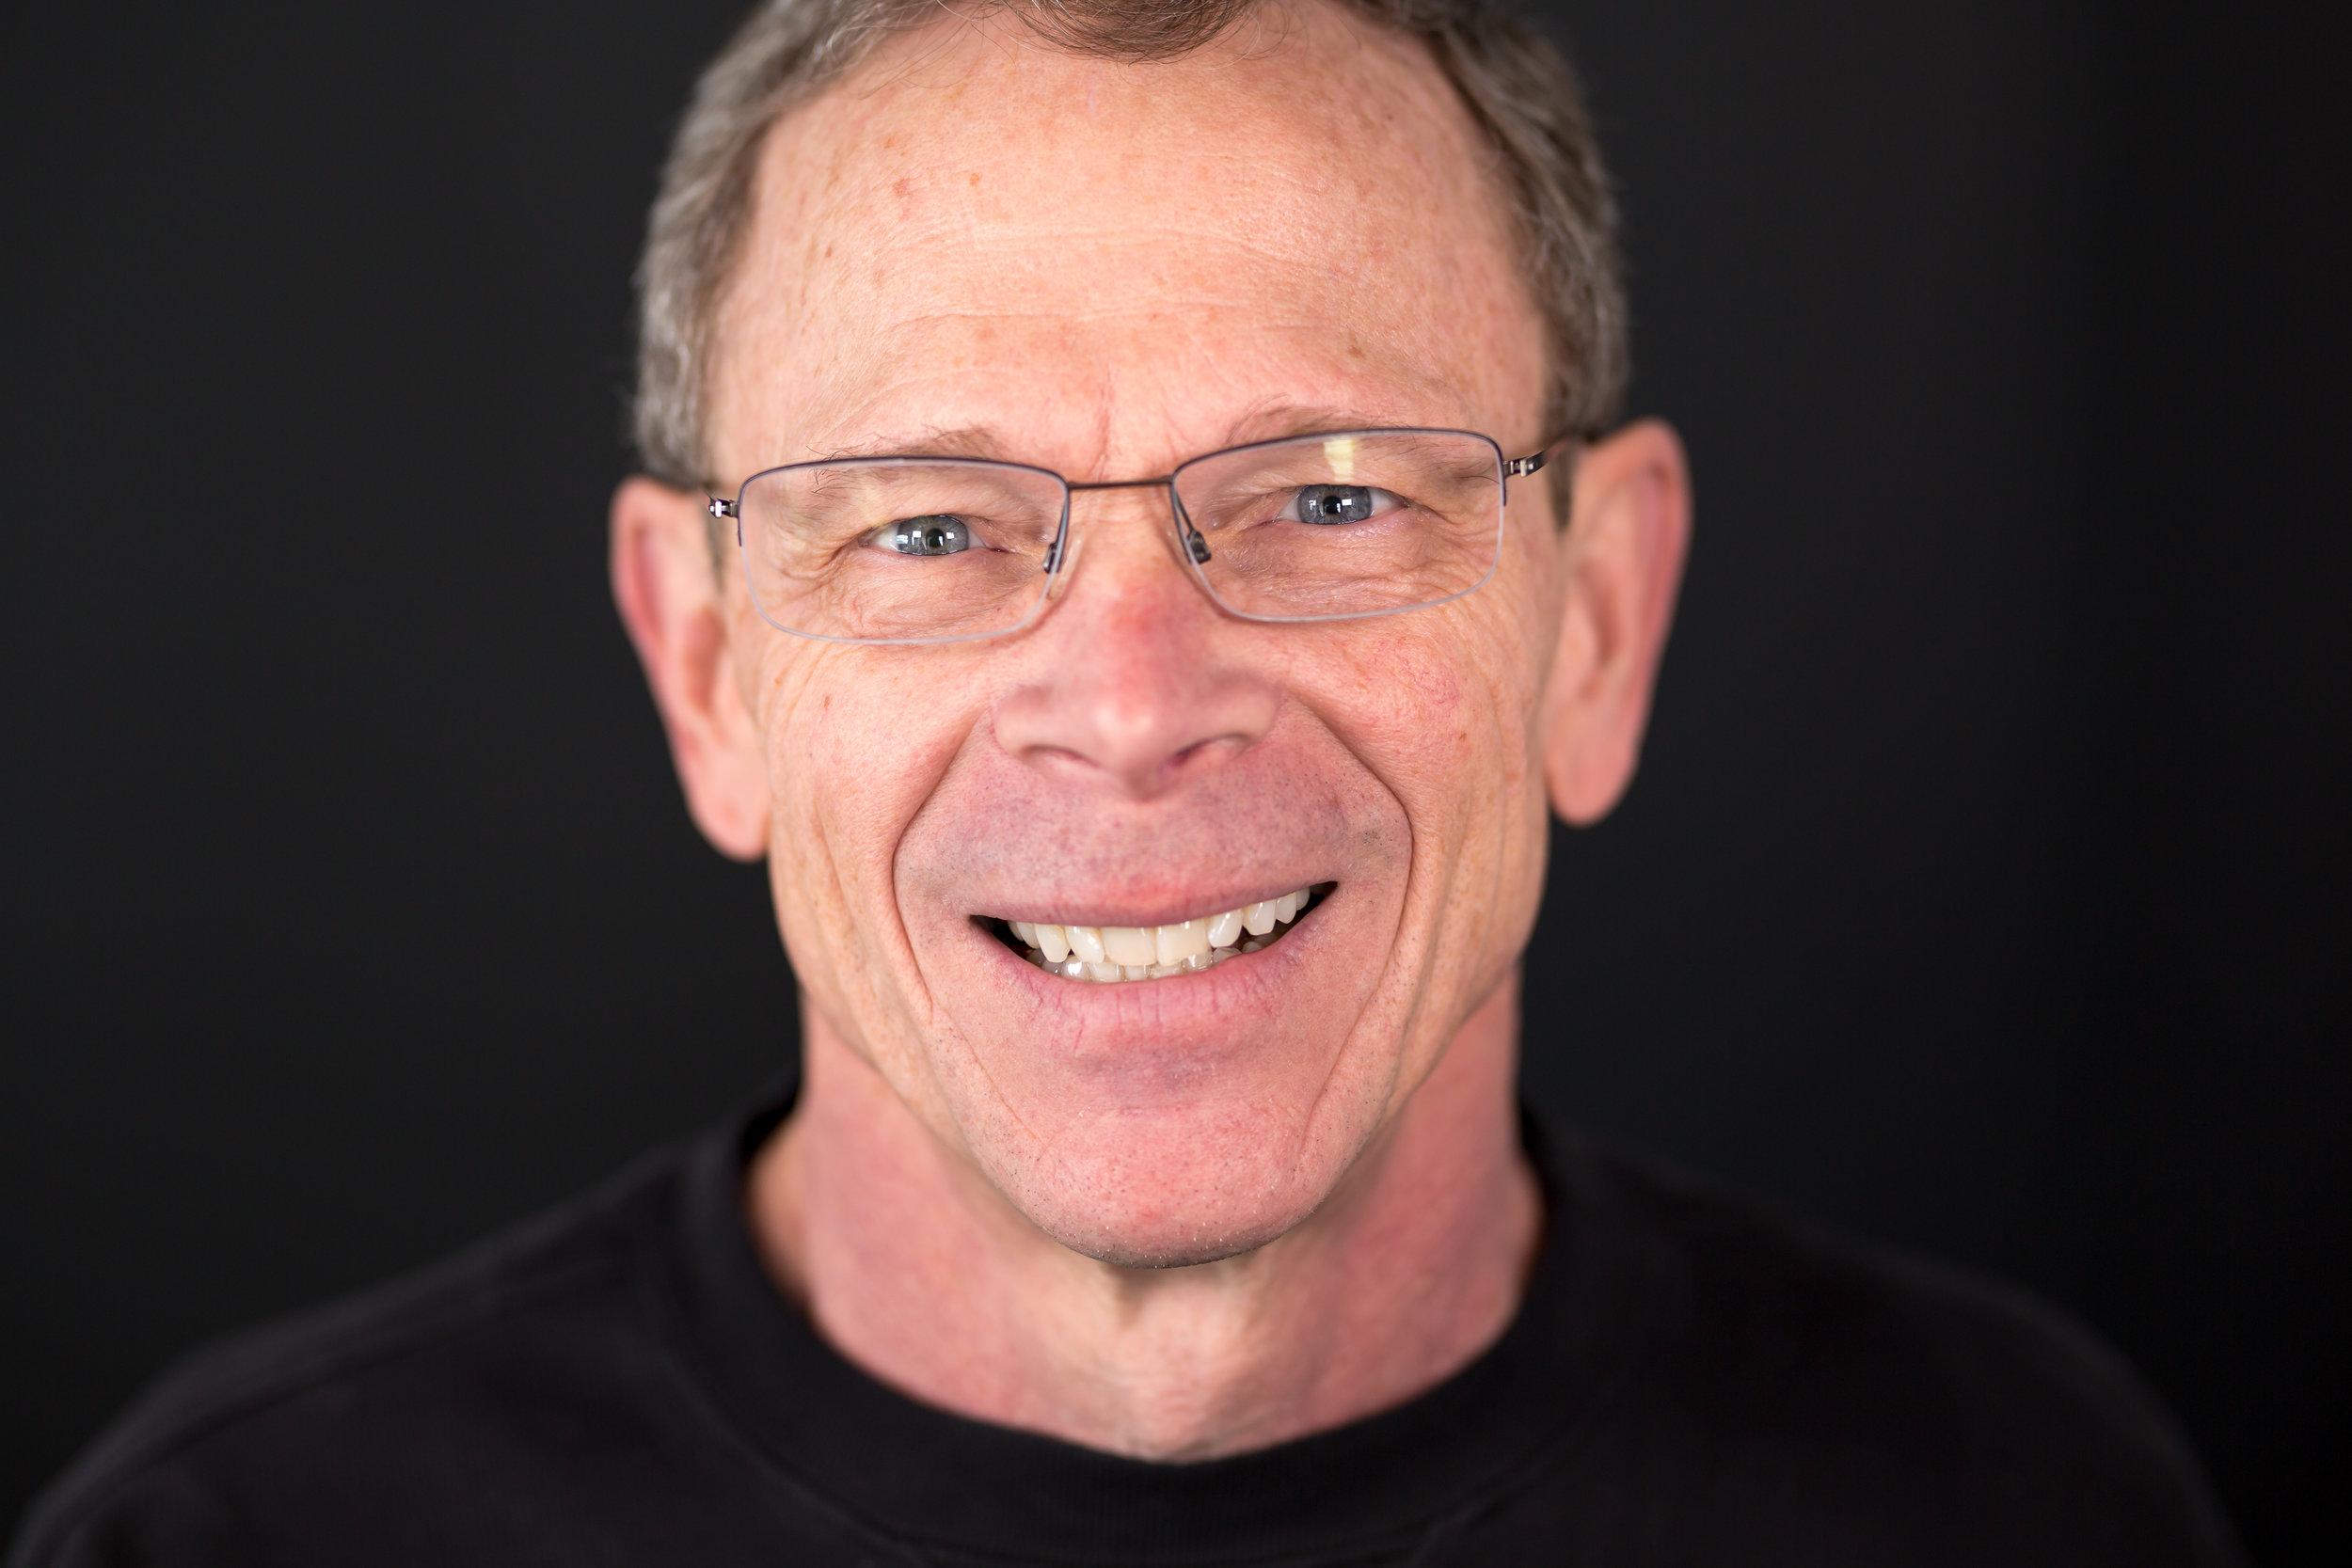 43 Dave Burdakin Faces of Donation-206.jpg